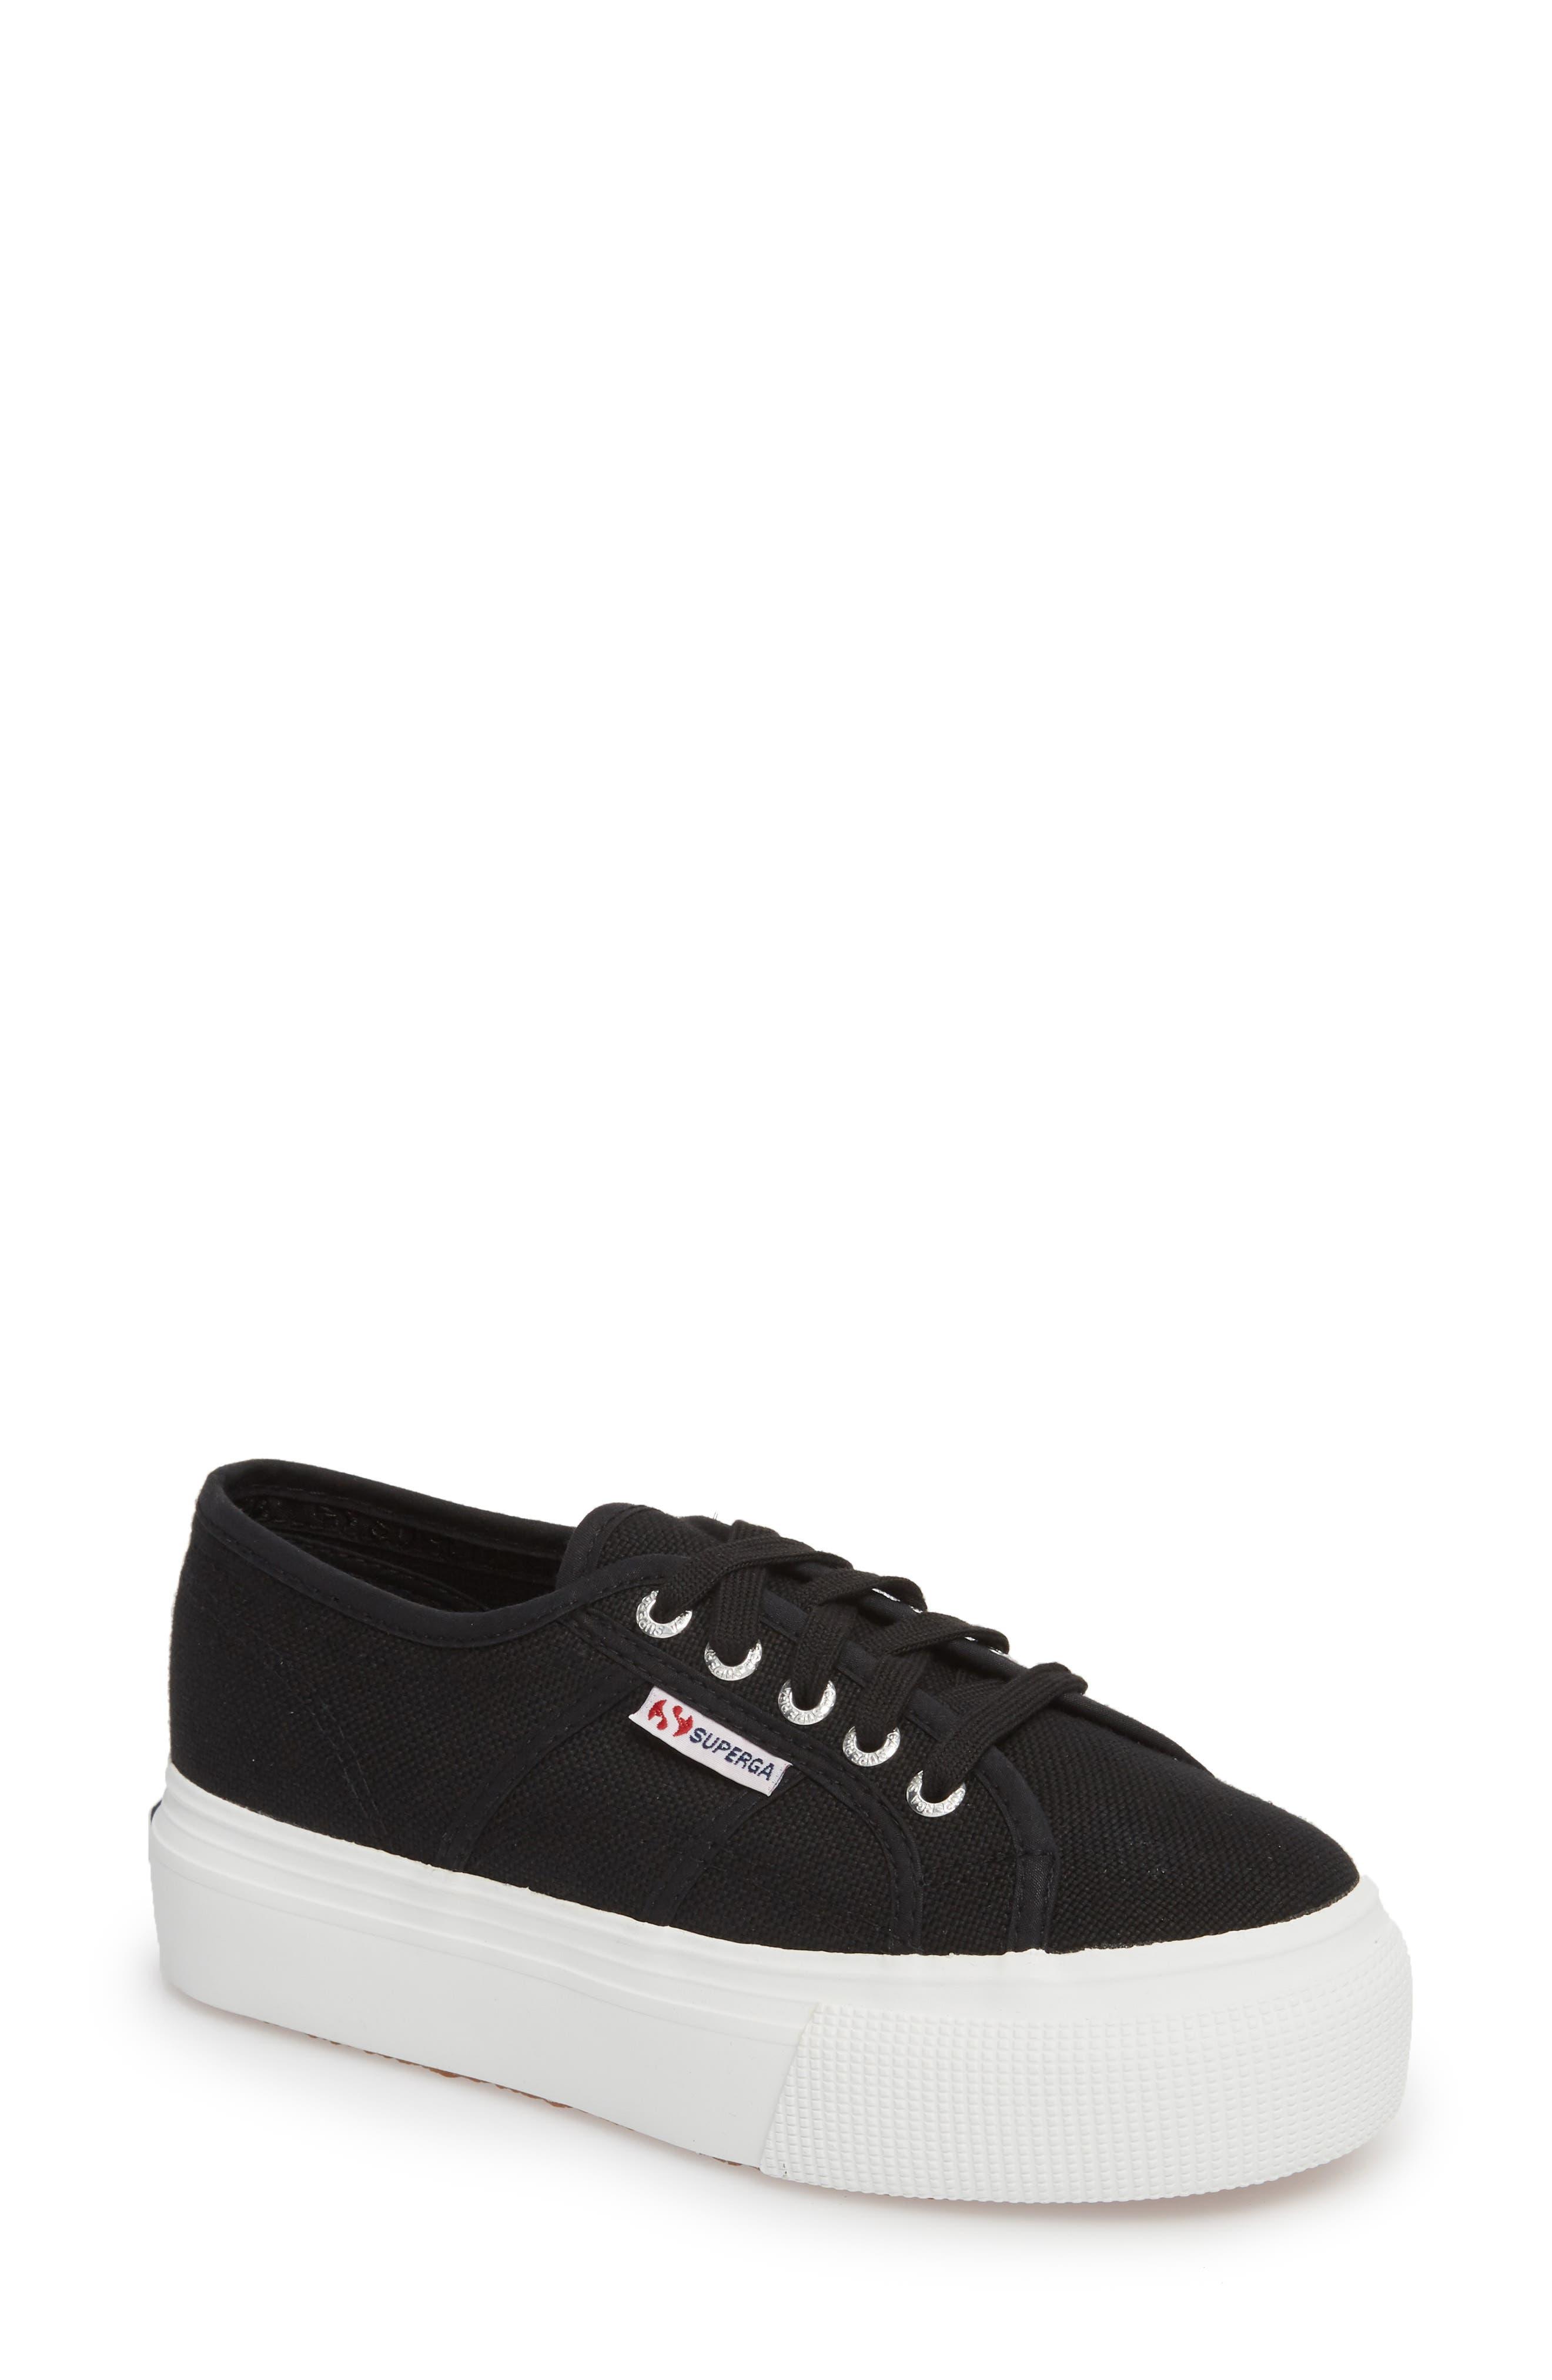 'Acot Linea' Sneaker,                         Main,                         color, BLACK/ WHITE